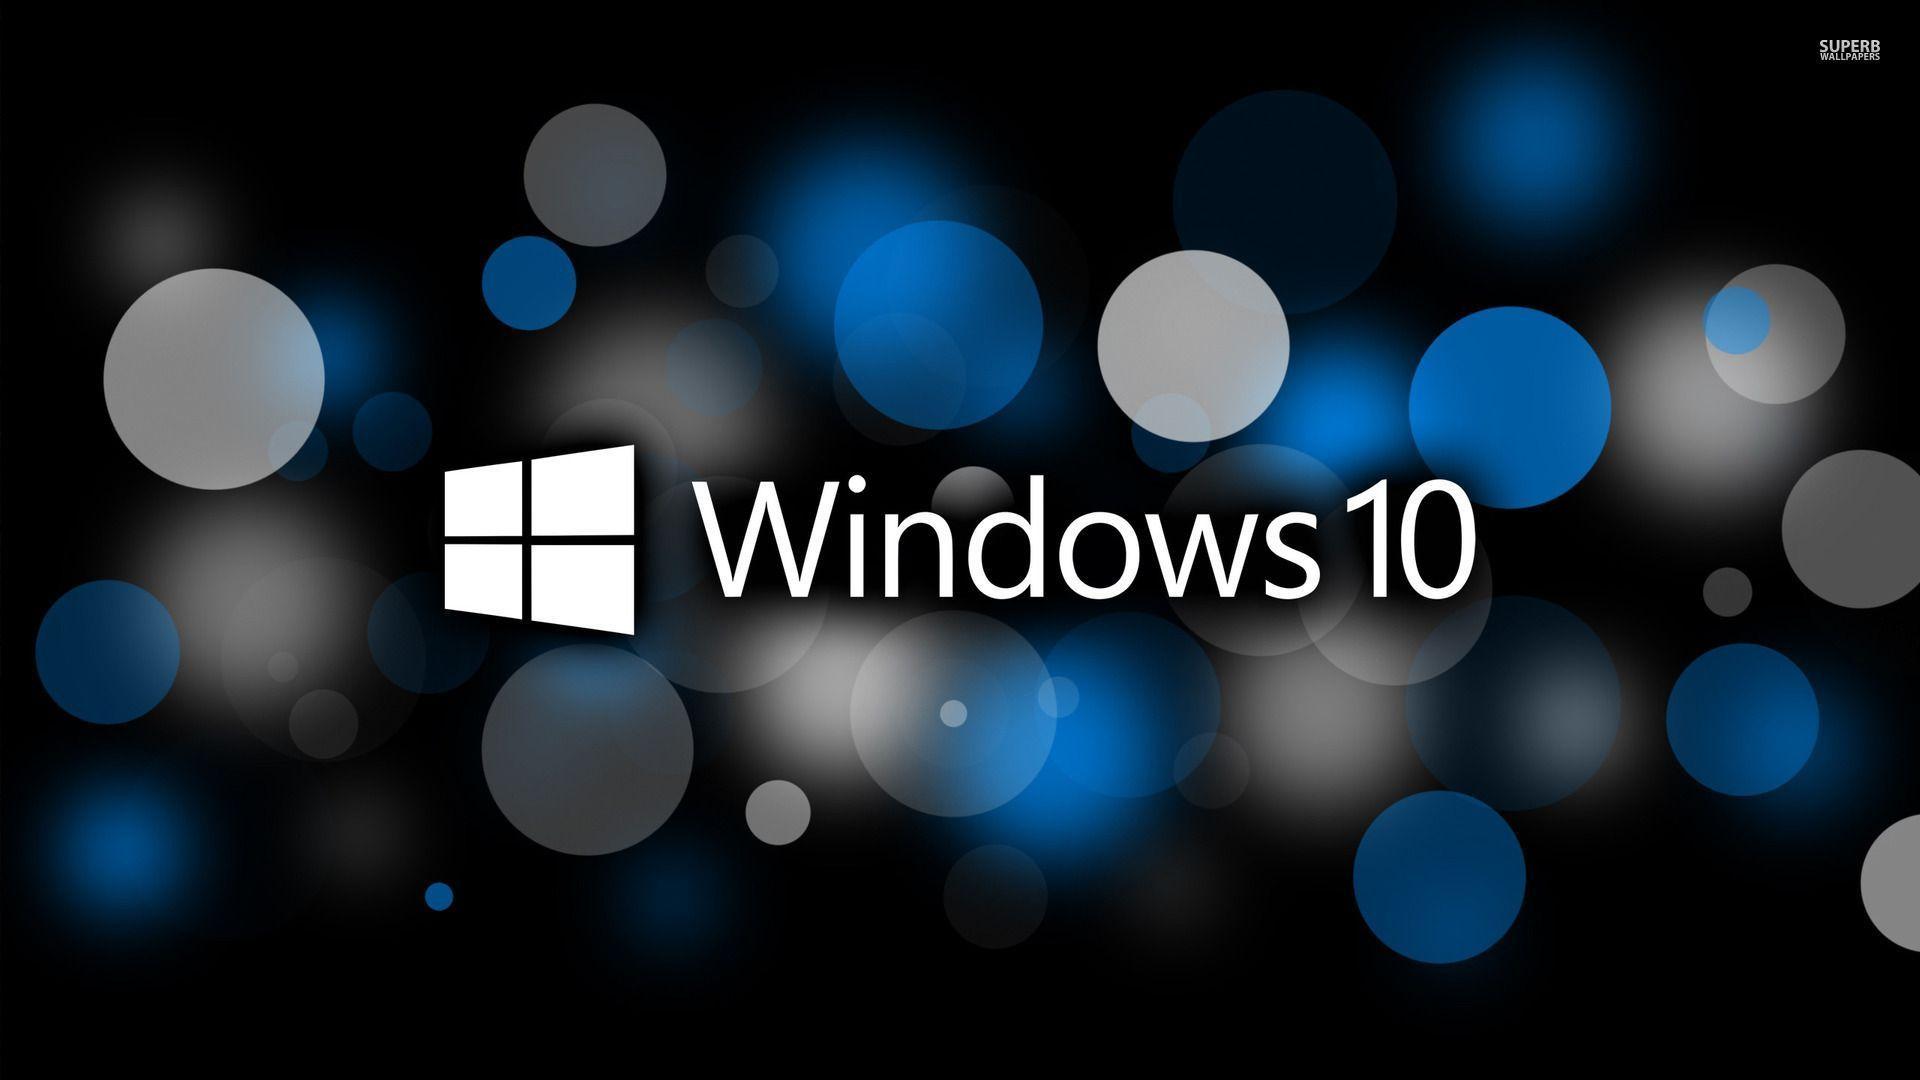 Windows 10 Wallpaper Hd 1366768 Jpg 19201080 Windows 10 Logo Wallpaper Windows 10 Windows 10